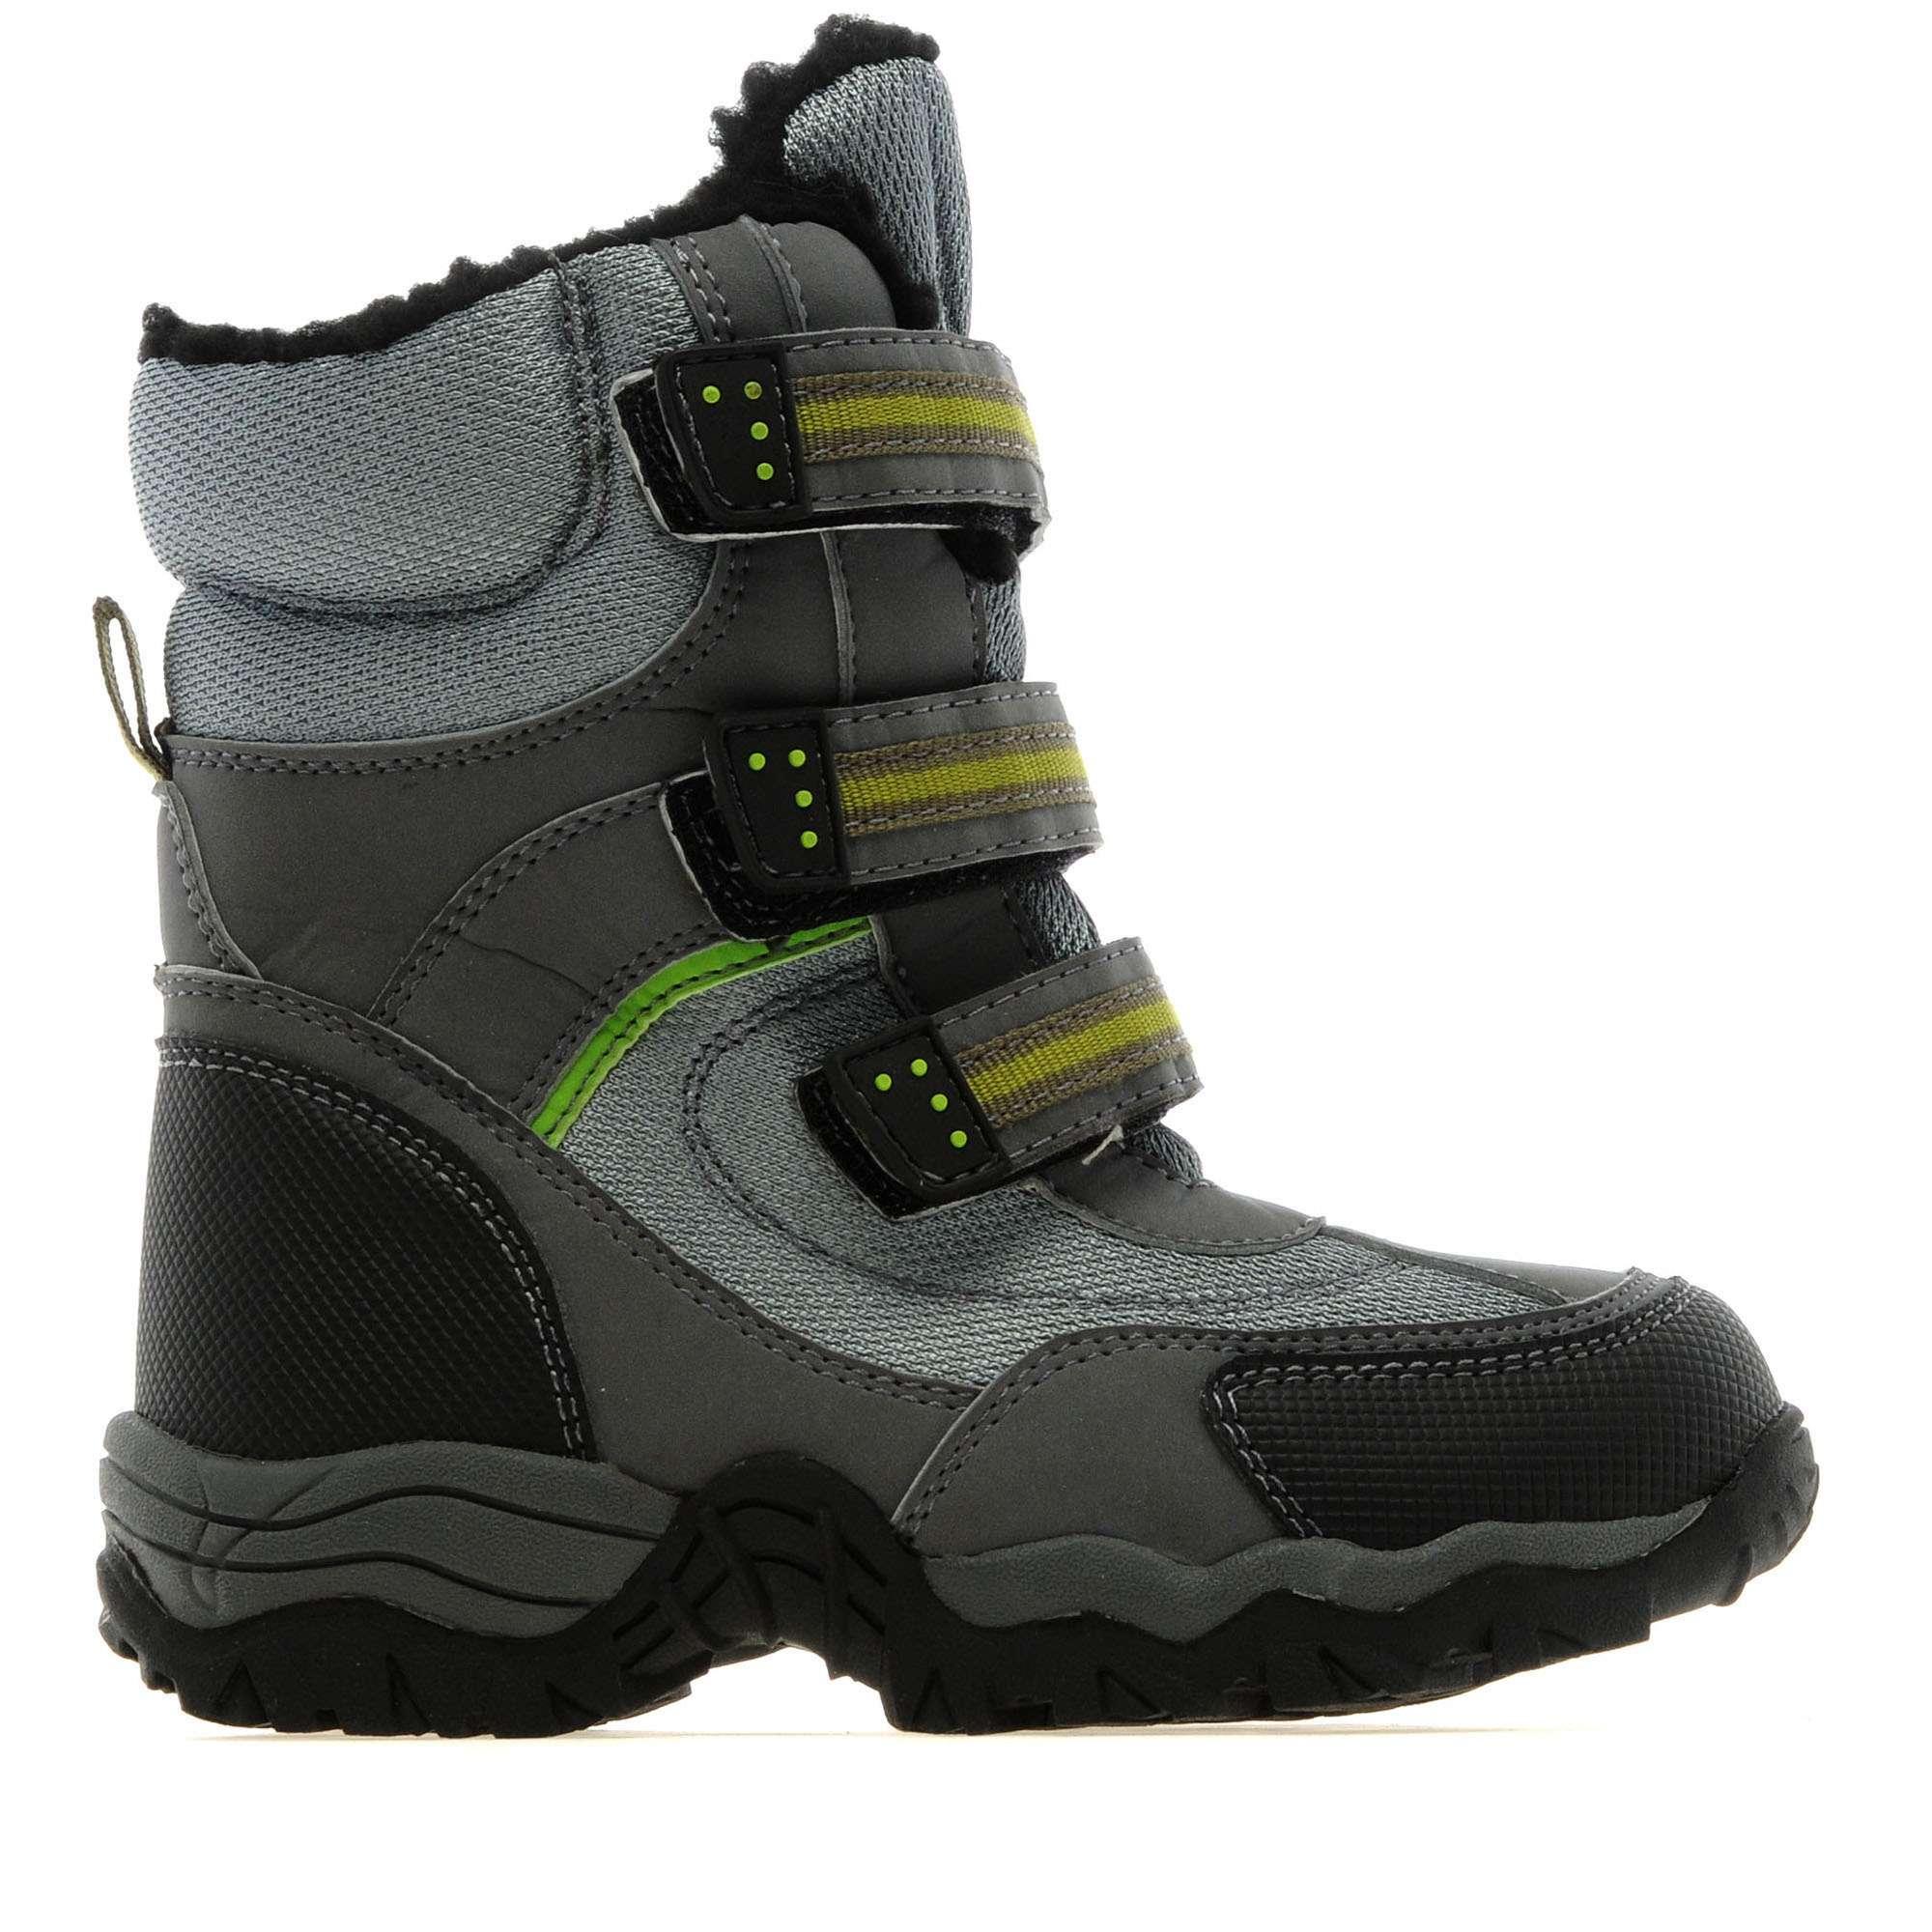 ALPINE Boy's Fur Snow Boots